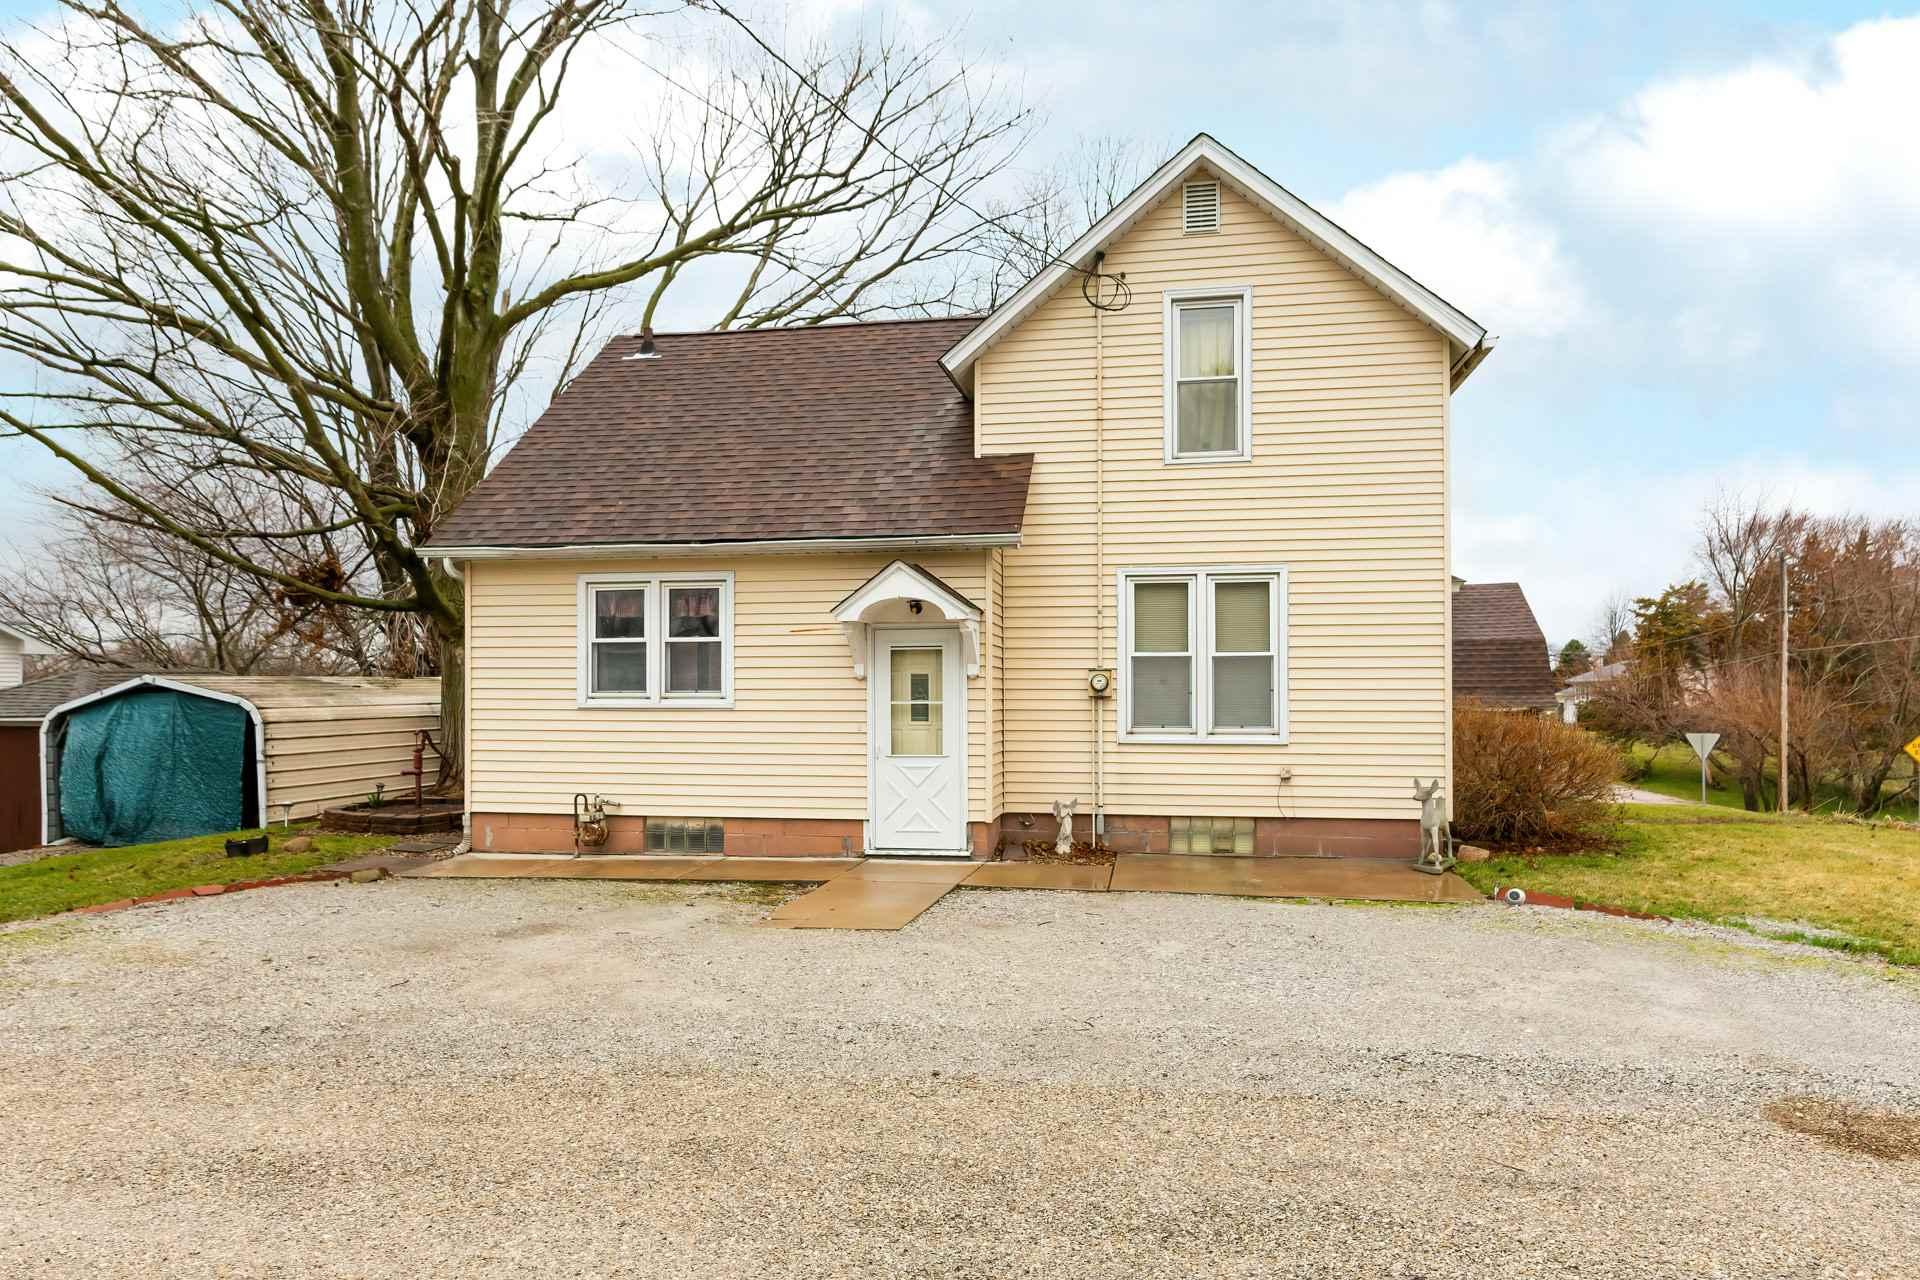 201 W MEUSE Property Photo - Blue Grass, IA real estate listing